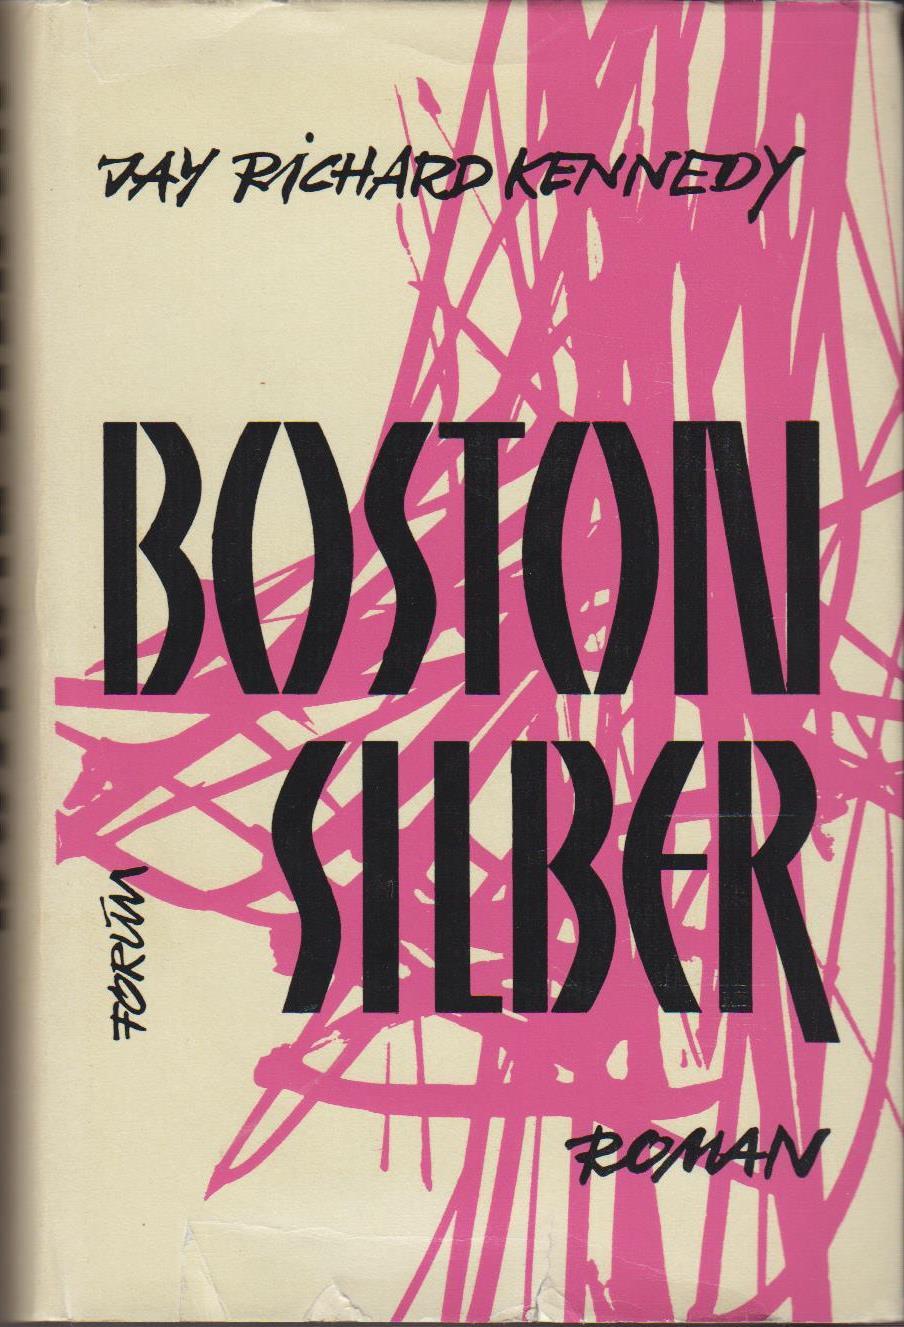 Boston Silber : Roman / Jay Richard Kennedy. [Übers. v. Grete Friedmann]